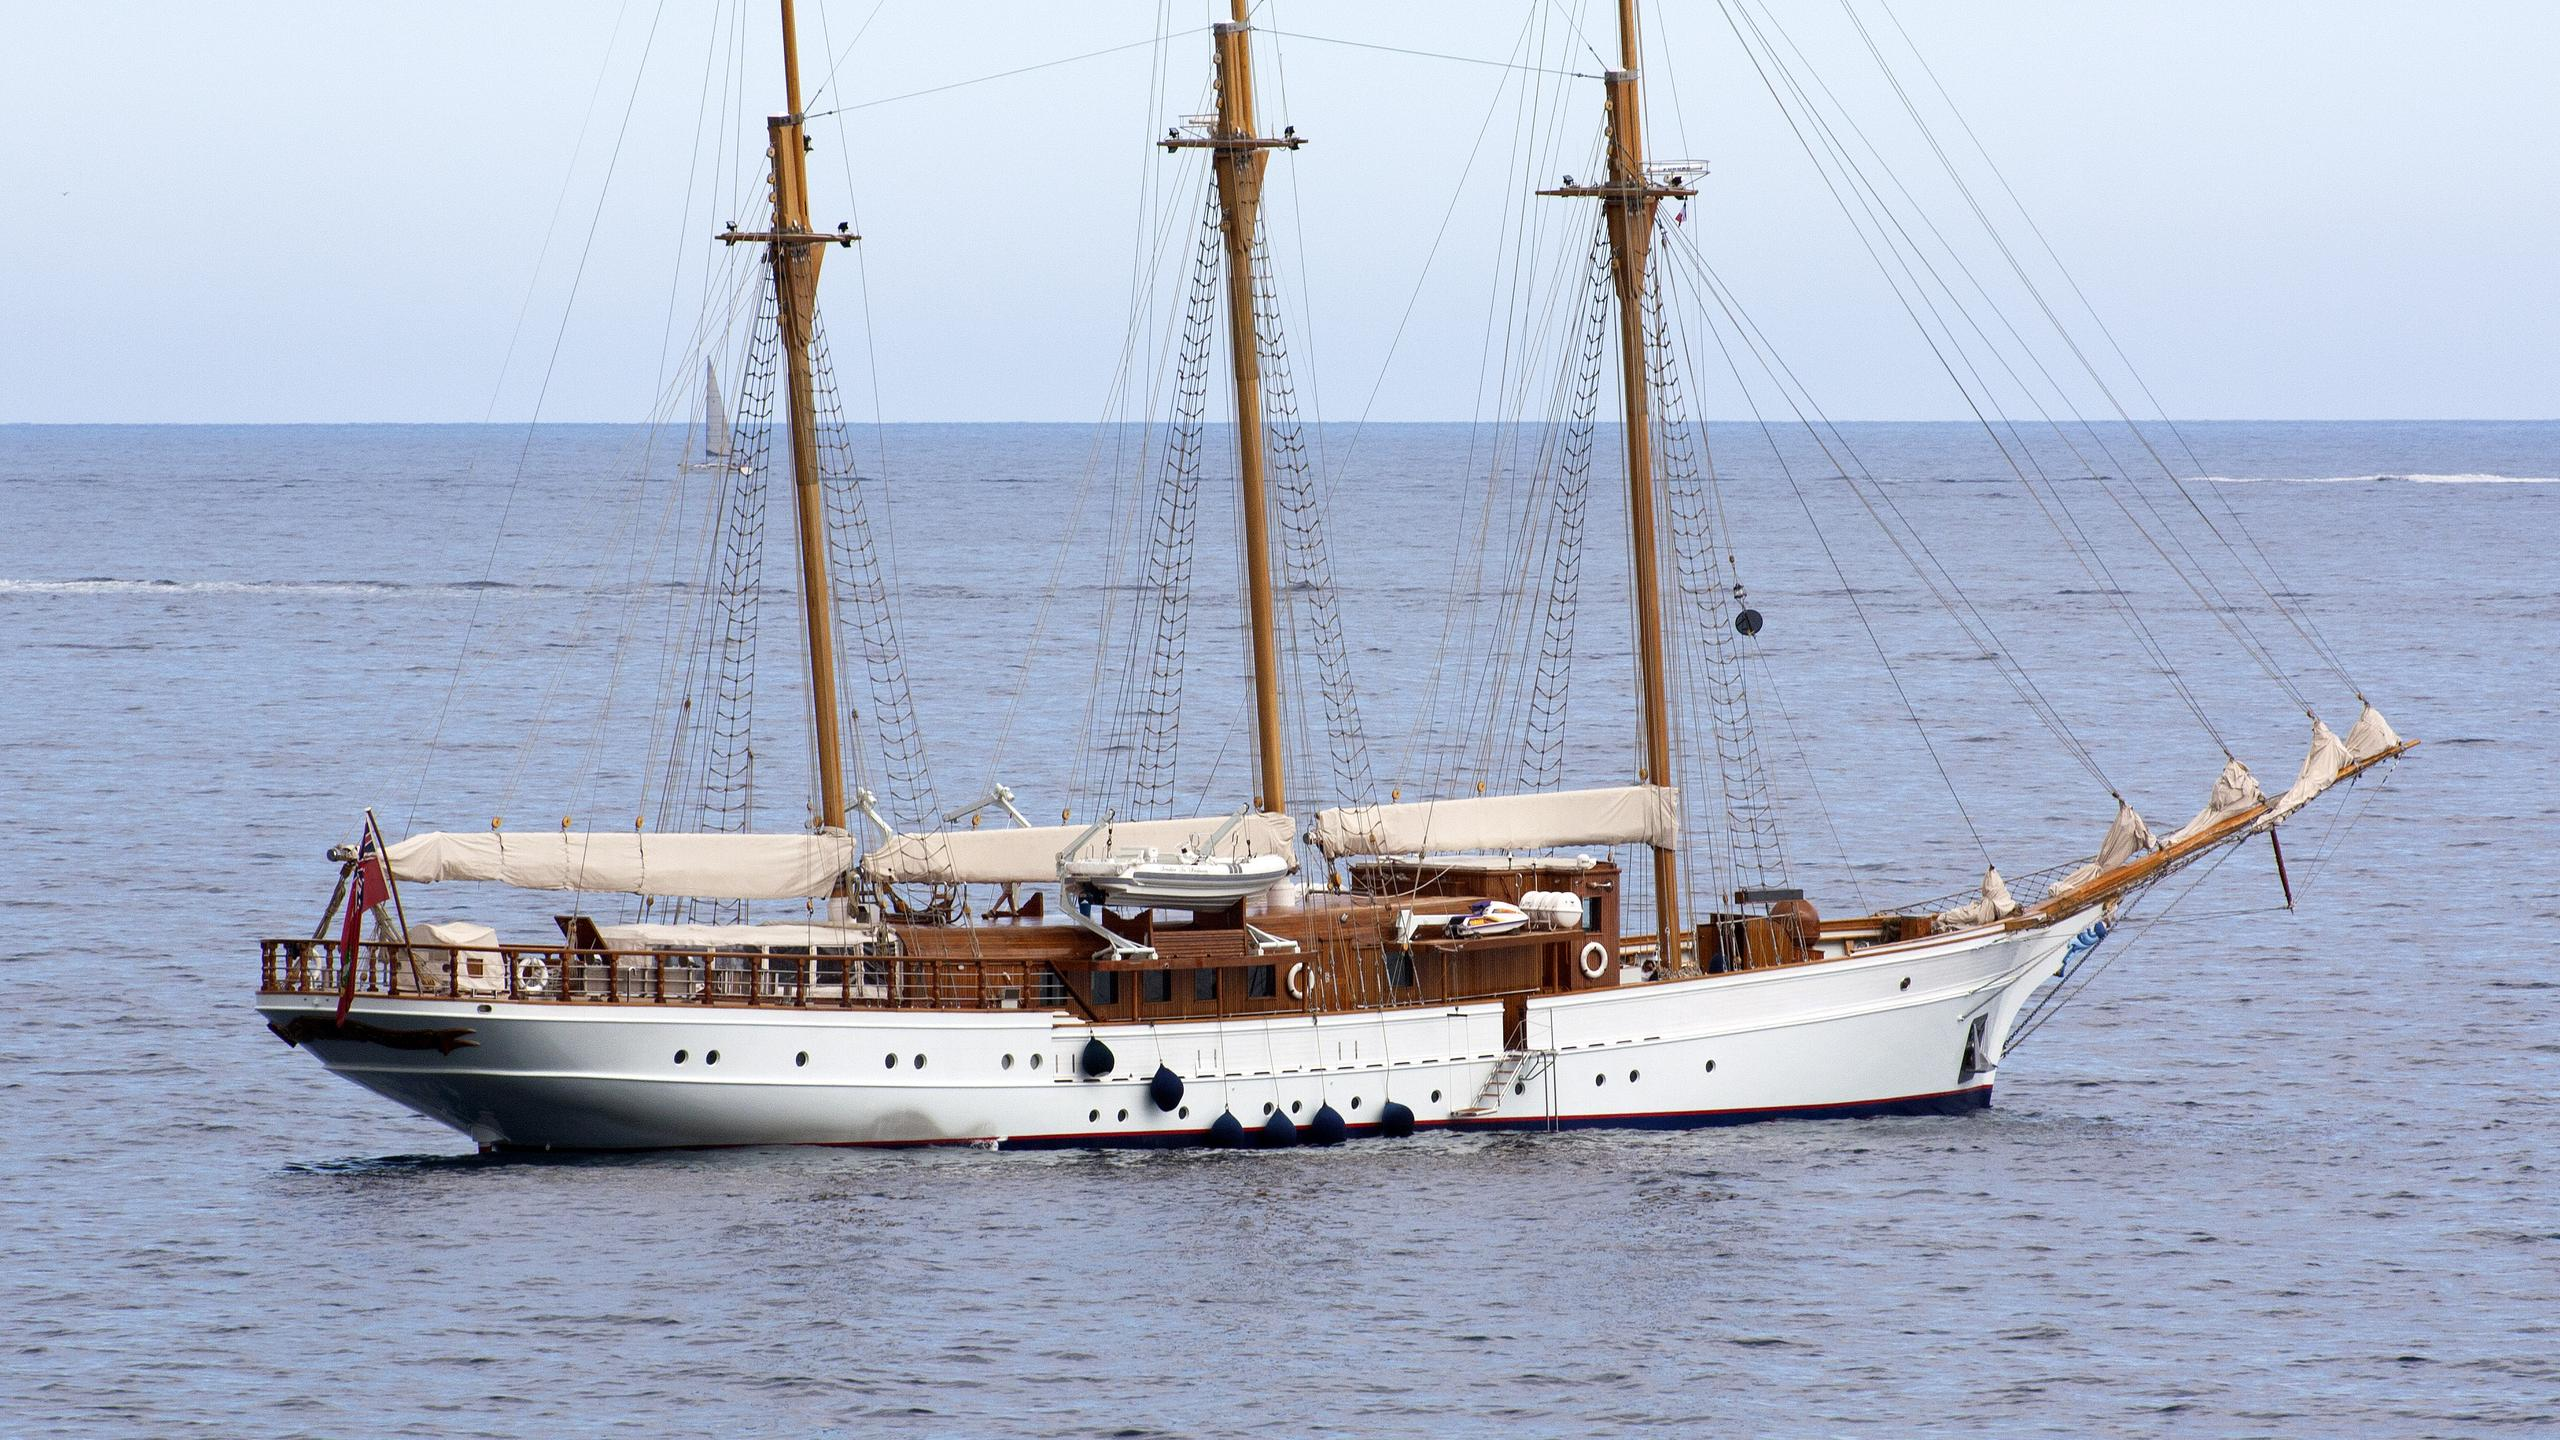 baboon-sailing-yacht-feab-marstrandsverken-1990-62m-profile